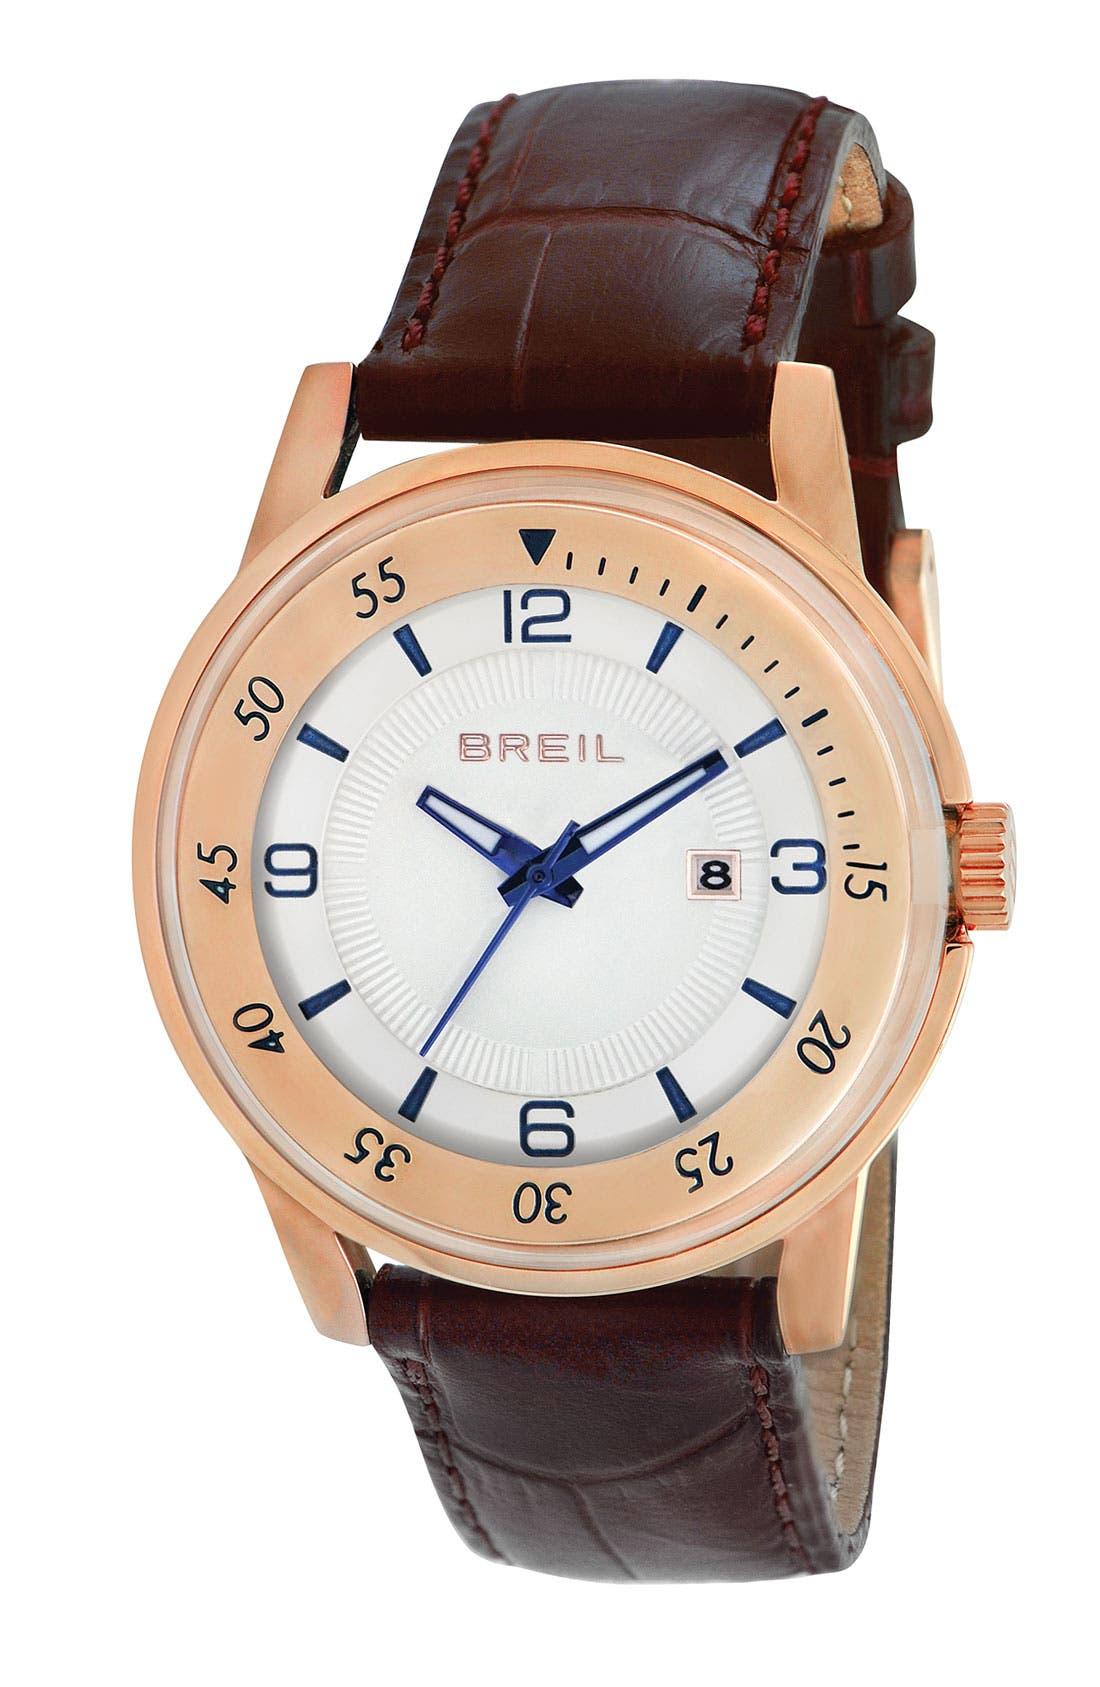 Main Image - Breil 'Orchestra' Round Leather Strap Watch, 40mm